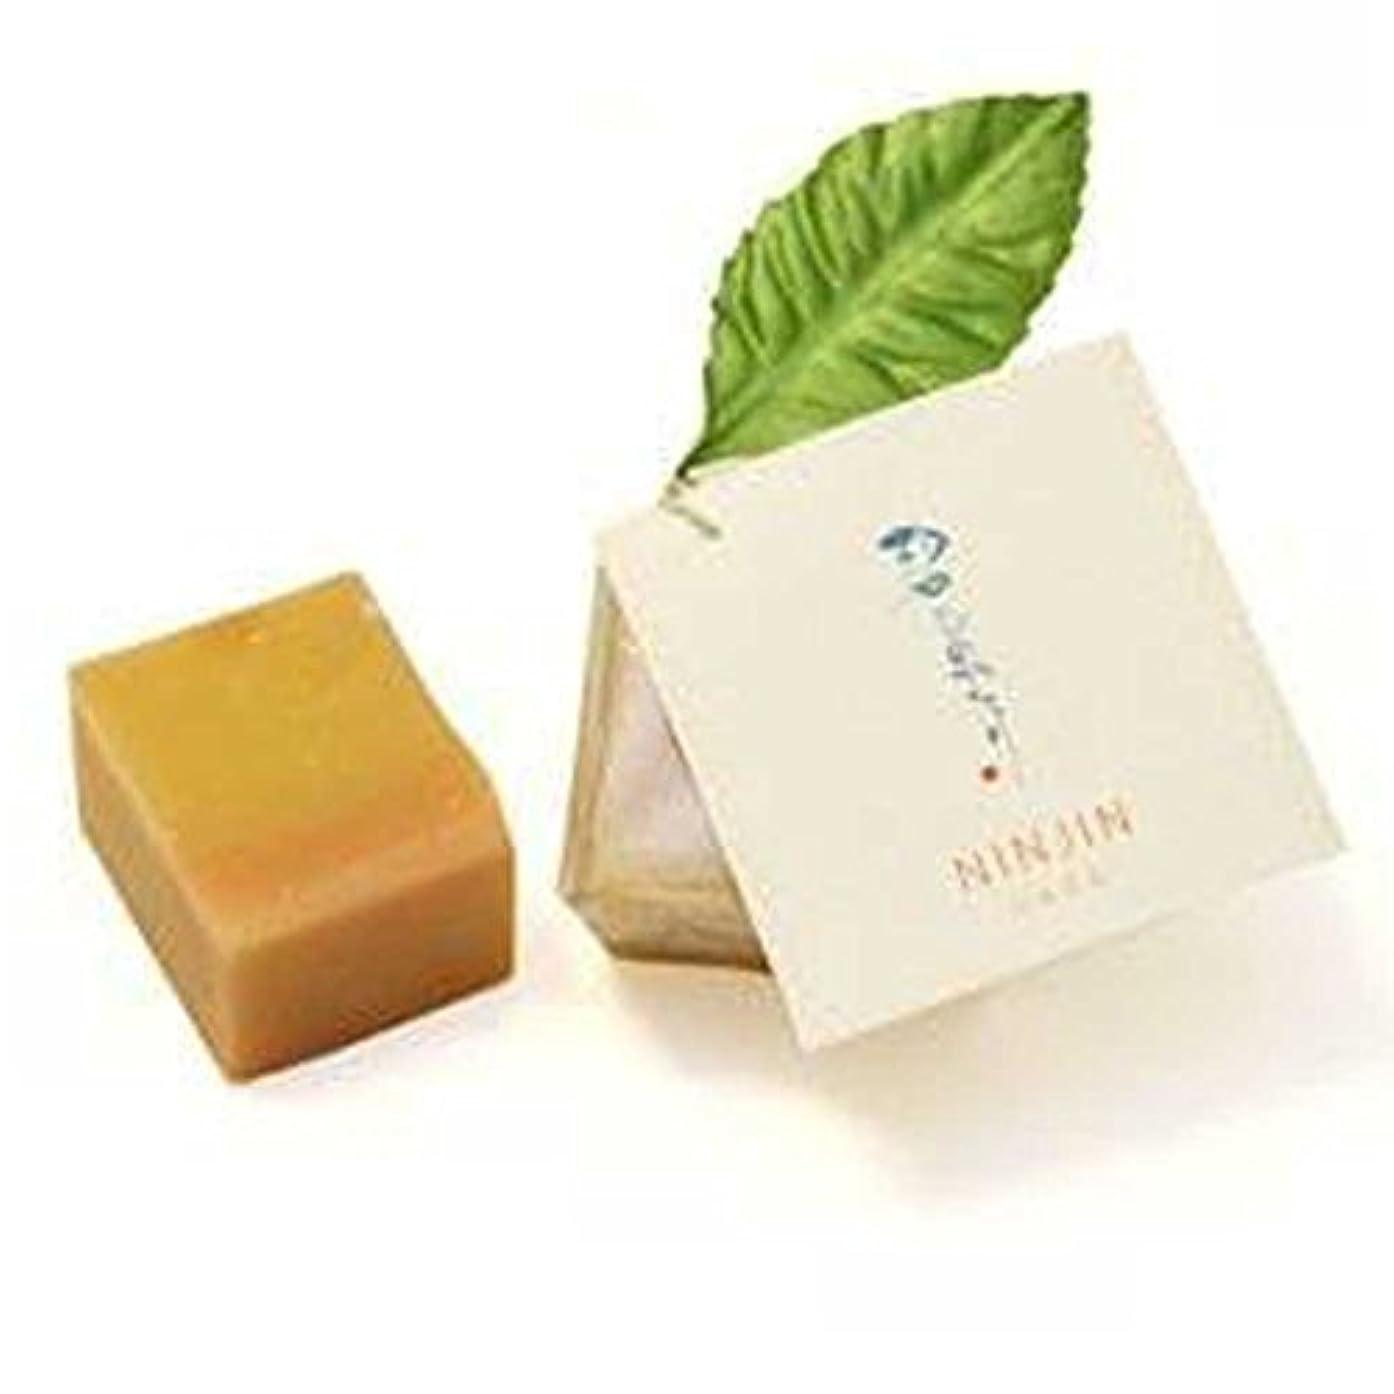 Herb?Room leaf NINJIN石けん 25g×2個